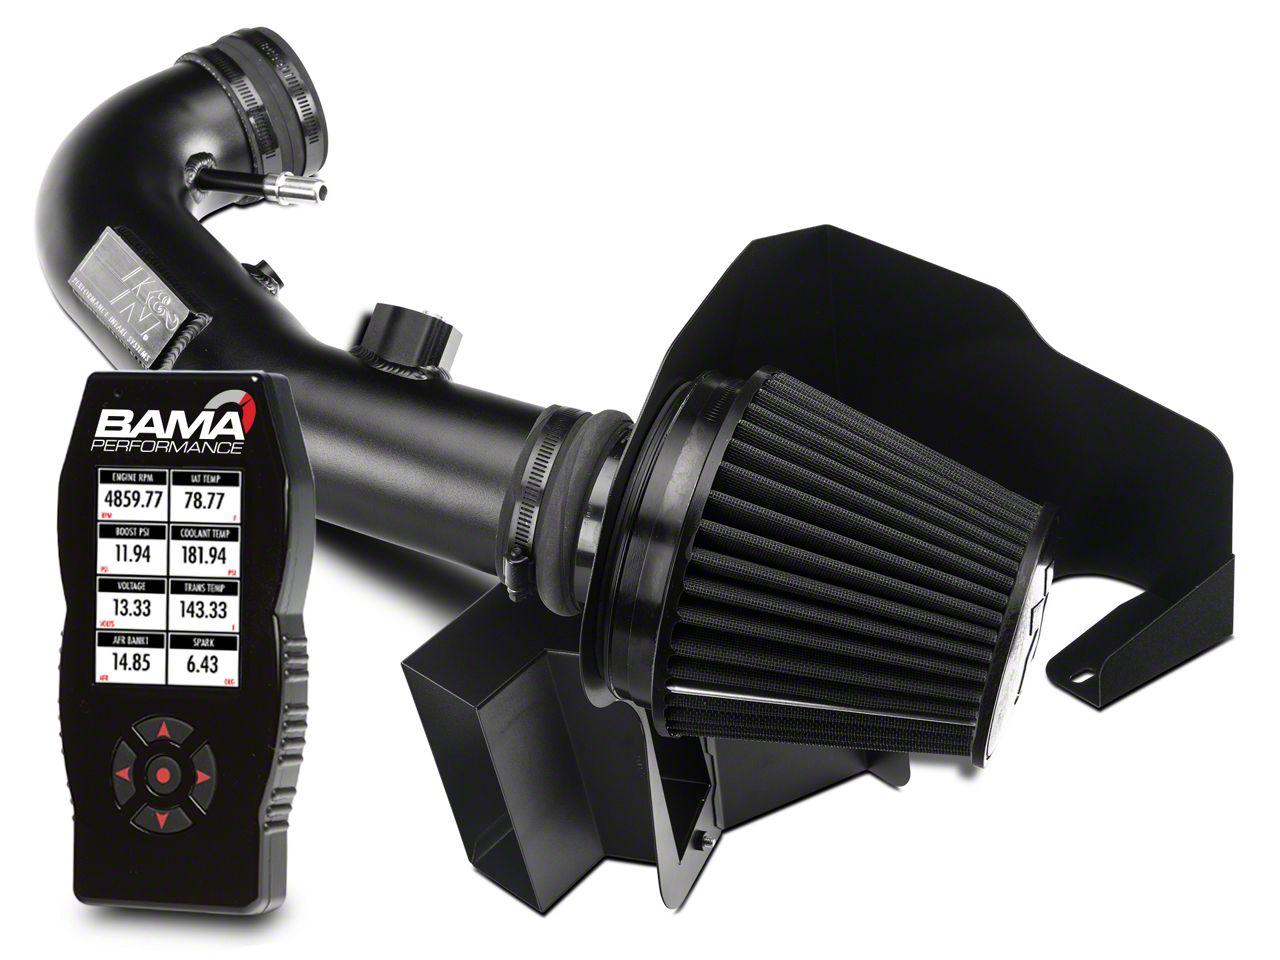 K&N Black Hawk Cold Air Intake & Bama X4 Tuner (11-14 GT)